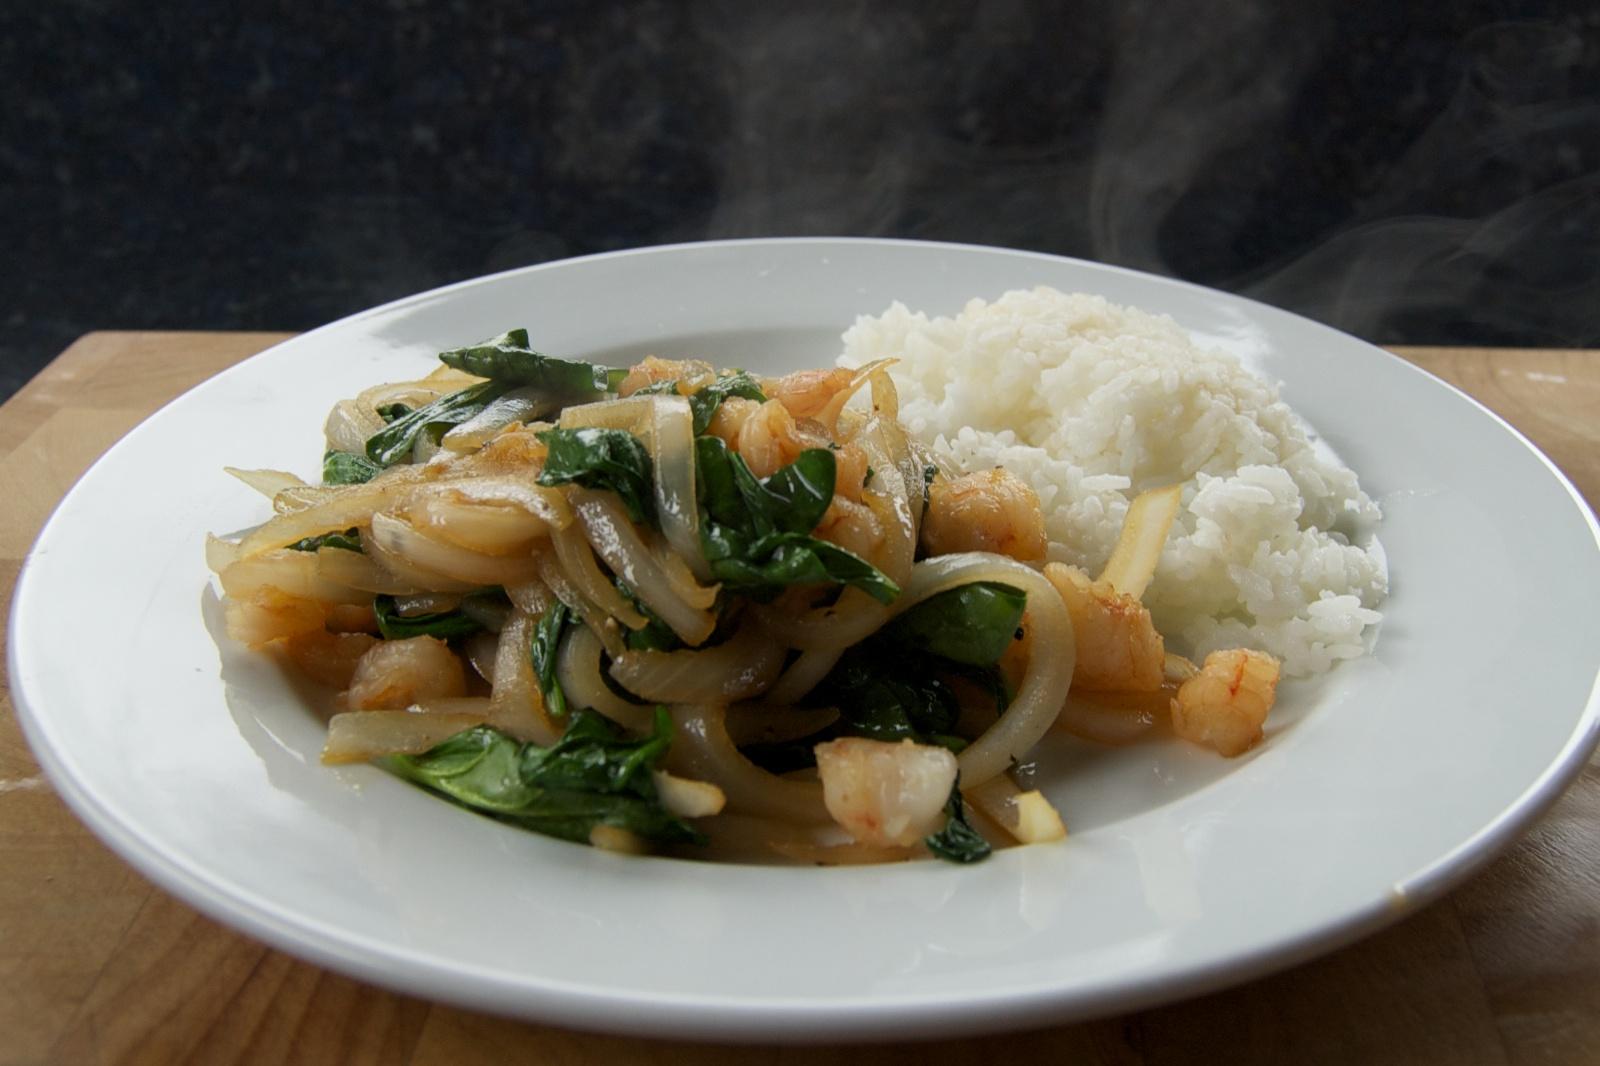 http://blog.rickk.com/food/2012/03/16/ate.2012.03.16.l.jpg